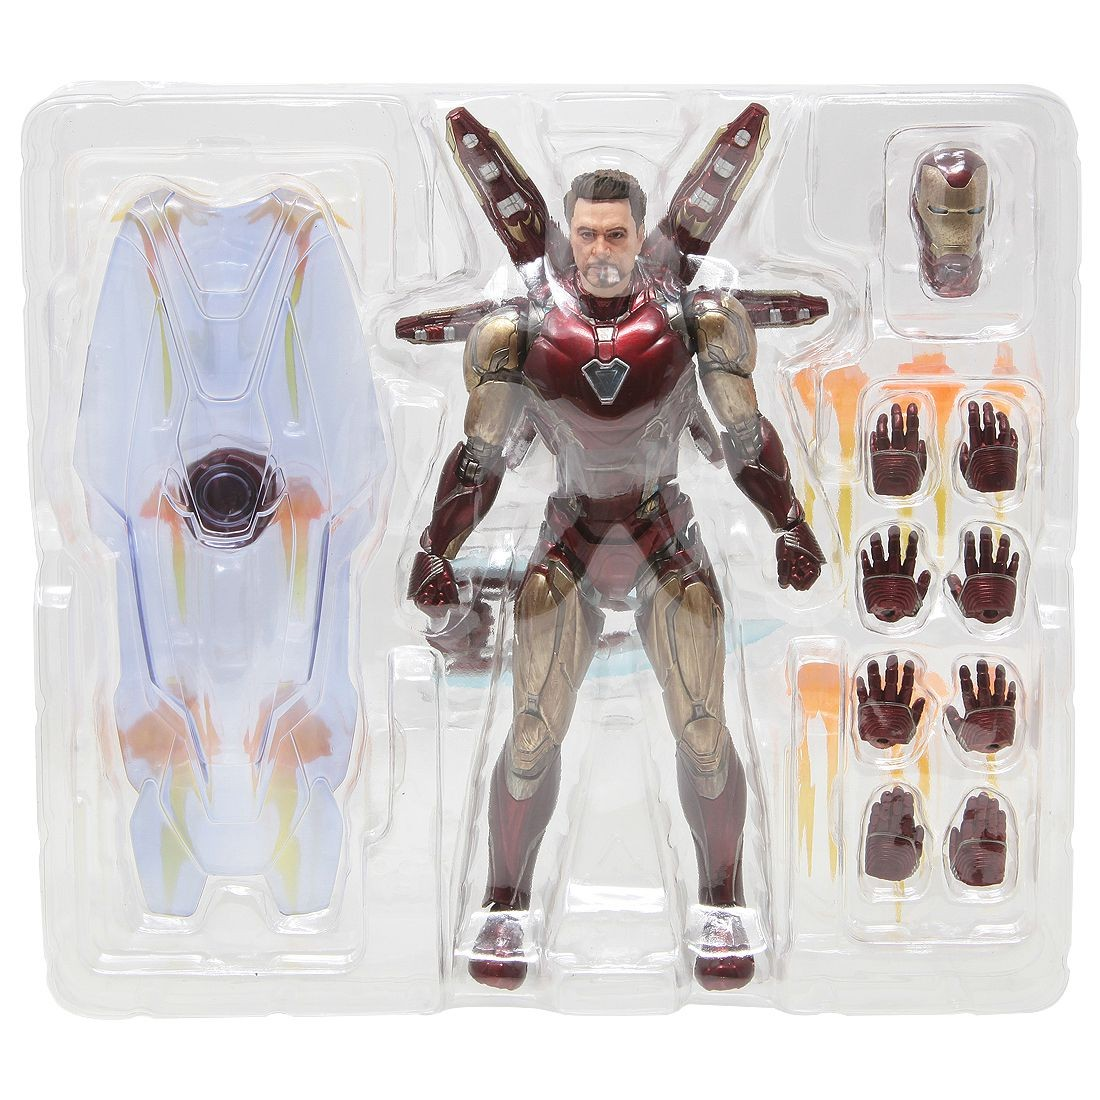 Final Battle Bandai S.H Iron Man Mark 85 Figuarts Avengers: Endgame